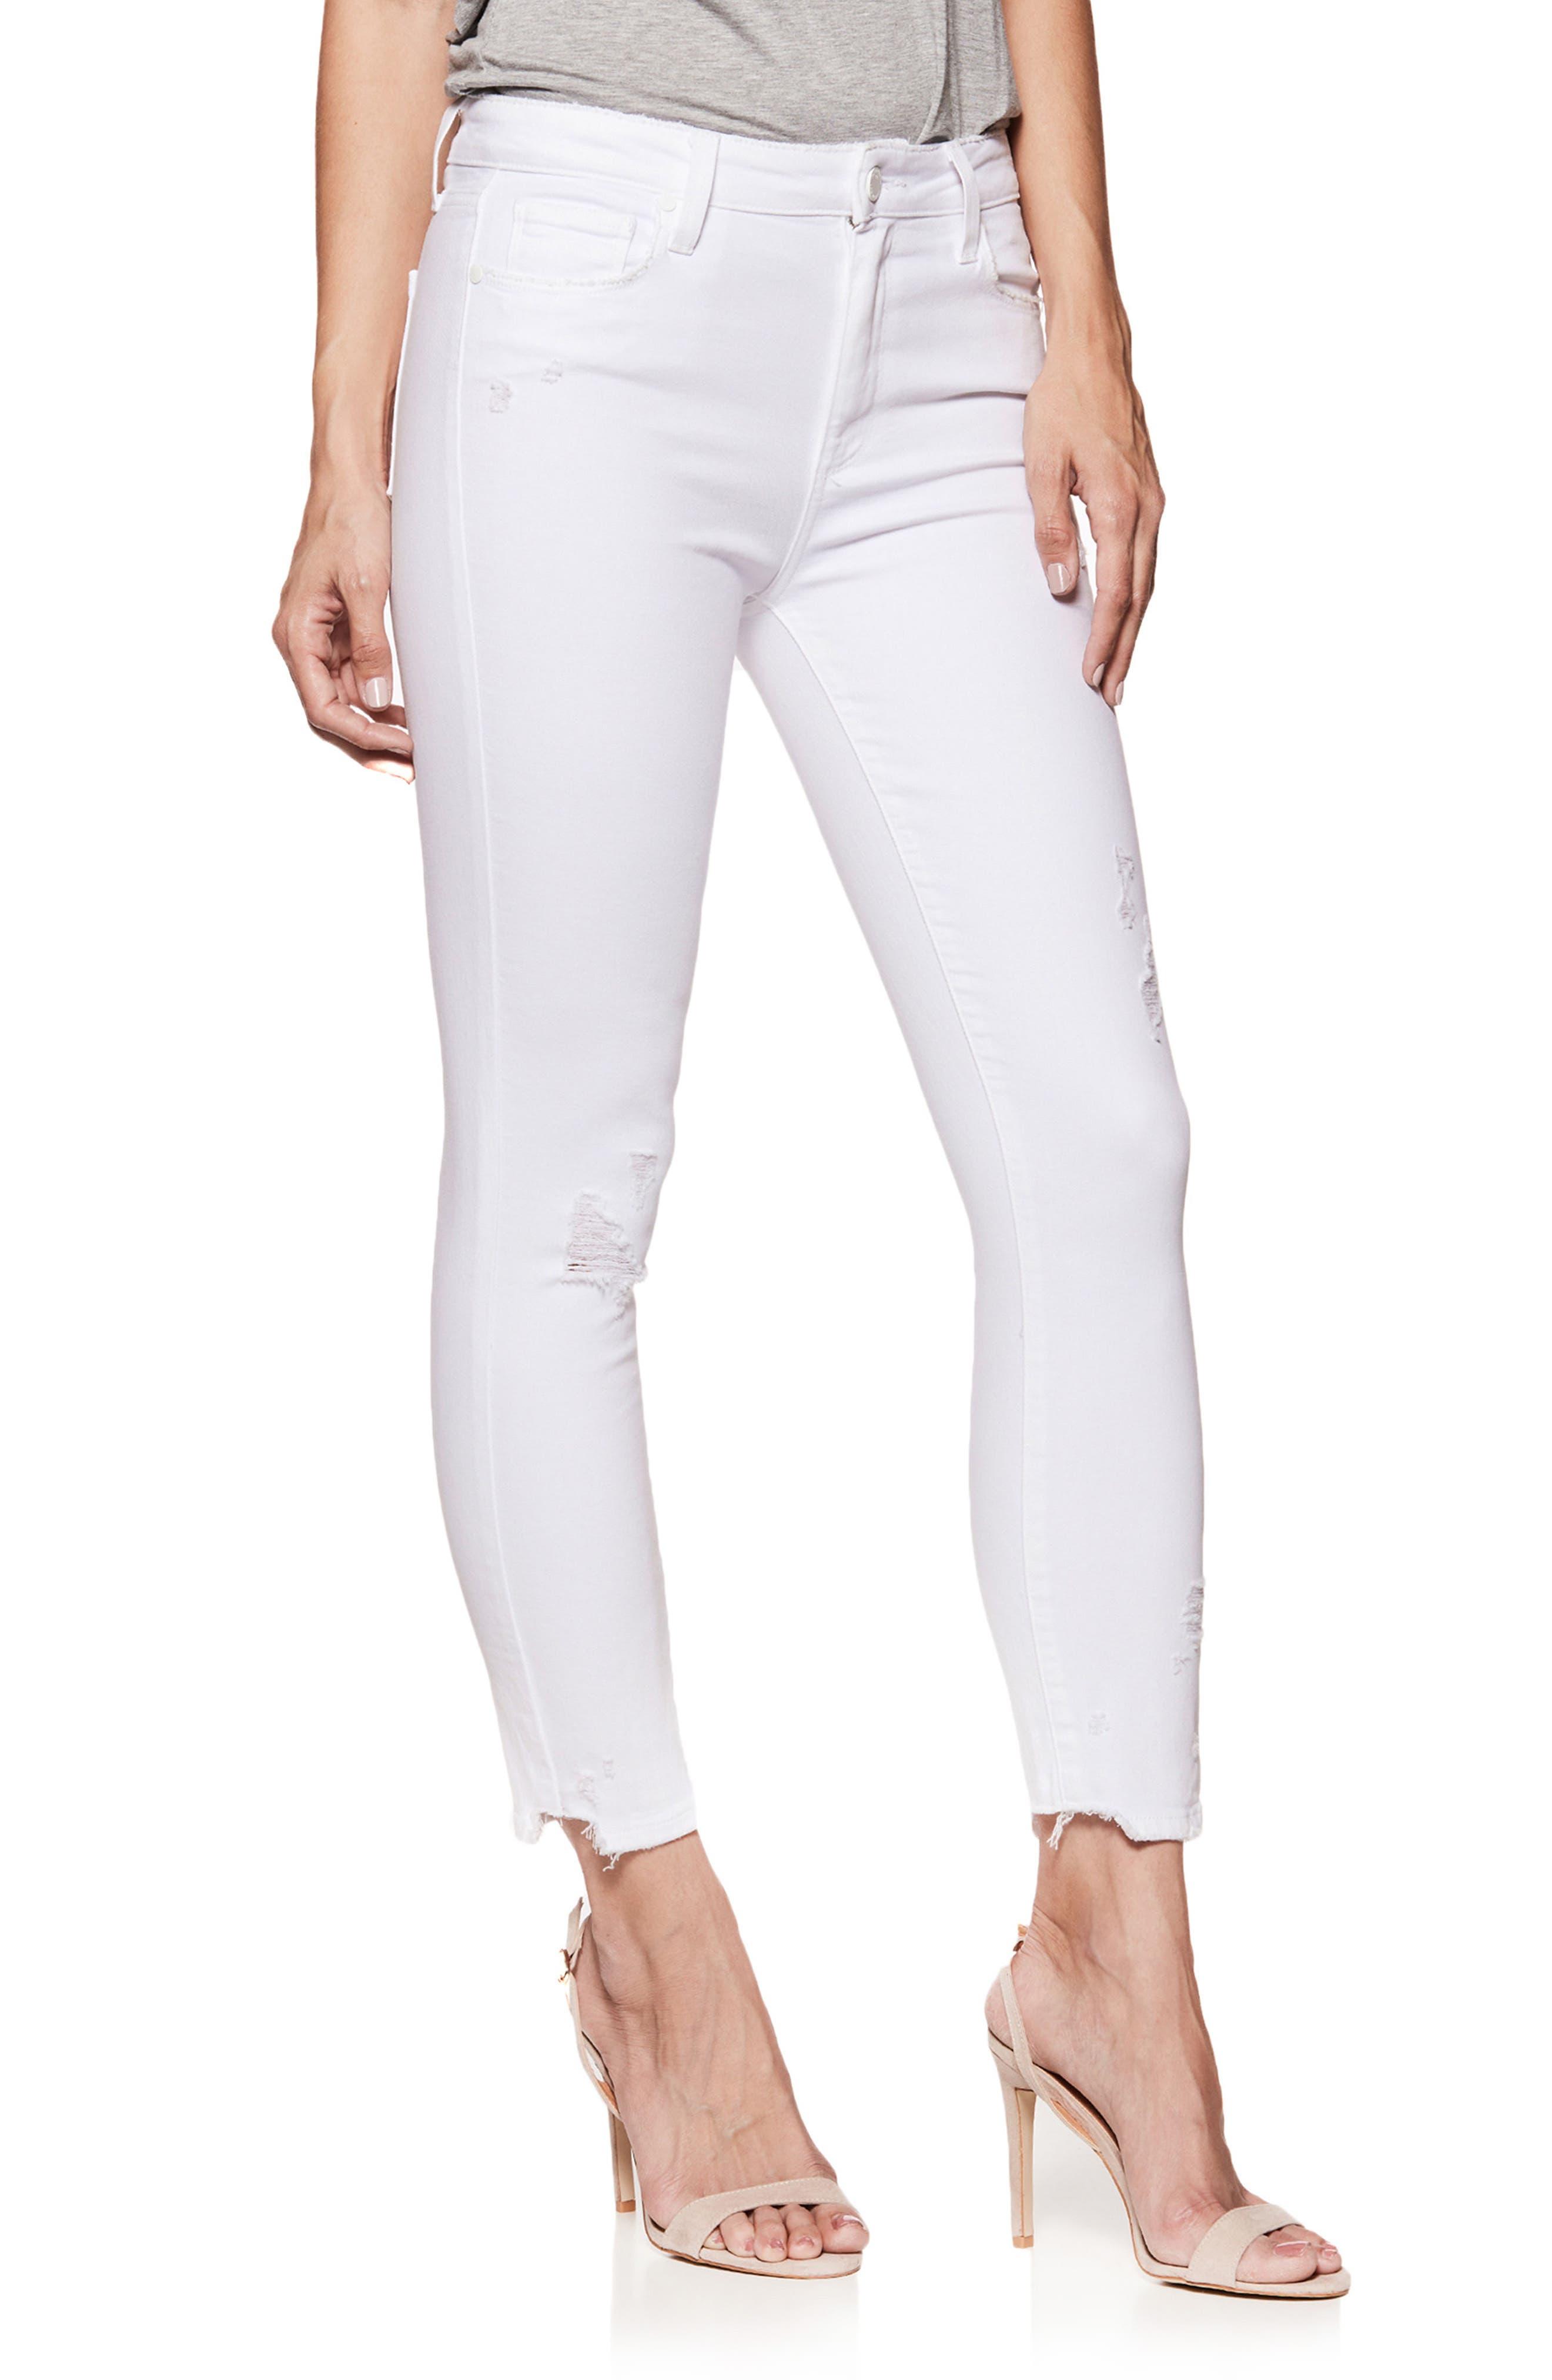 Hoxton High Waist Ankle Skinny Jeans,                         Main,                         color, Crisp White Destructed